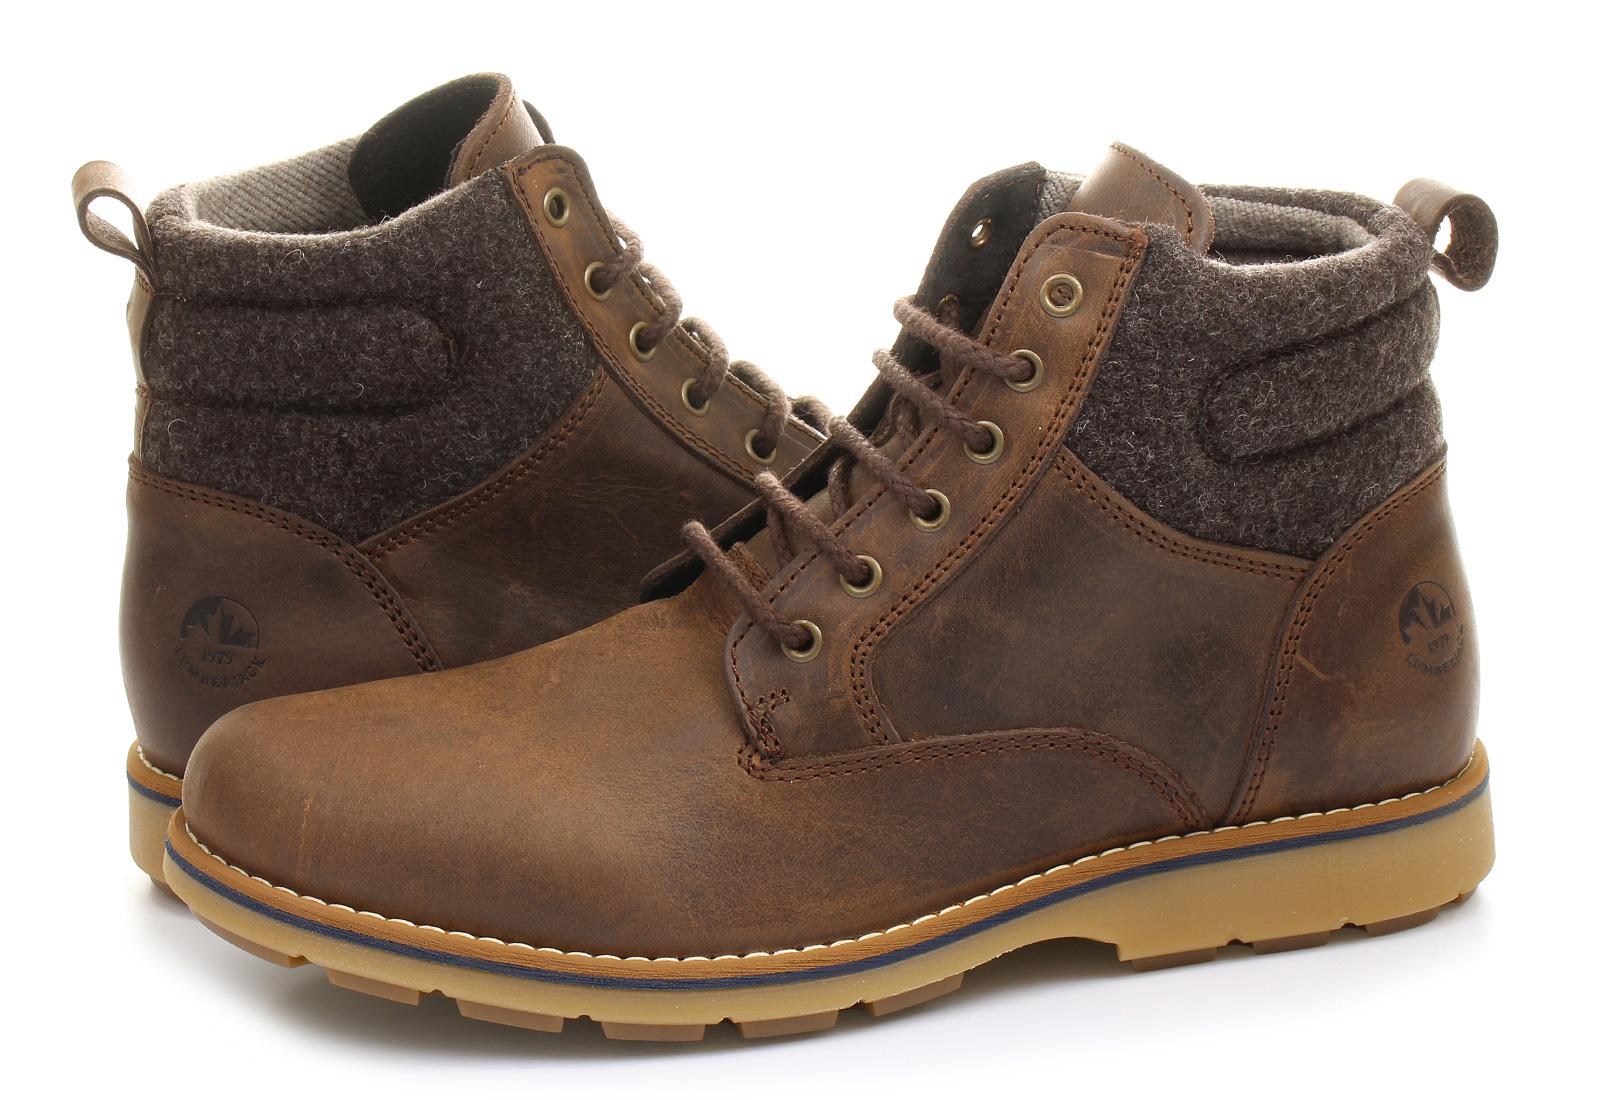 Lumberjack Boty - Hill - M166011H01-brnTenisky 0a6539b71d